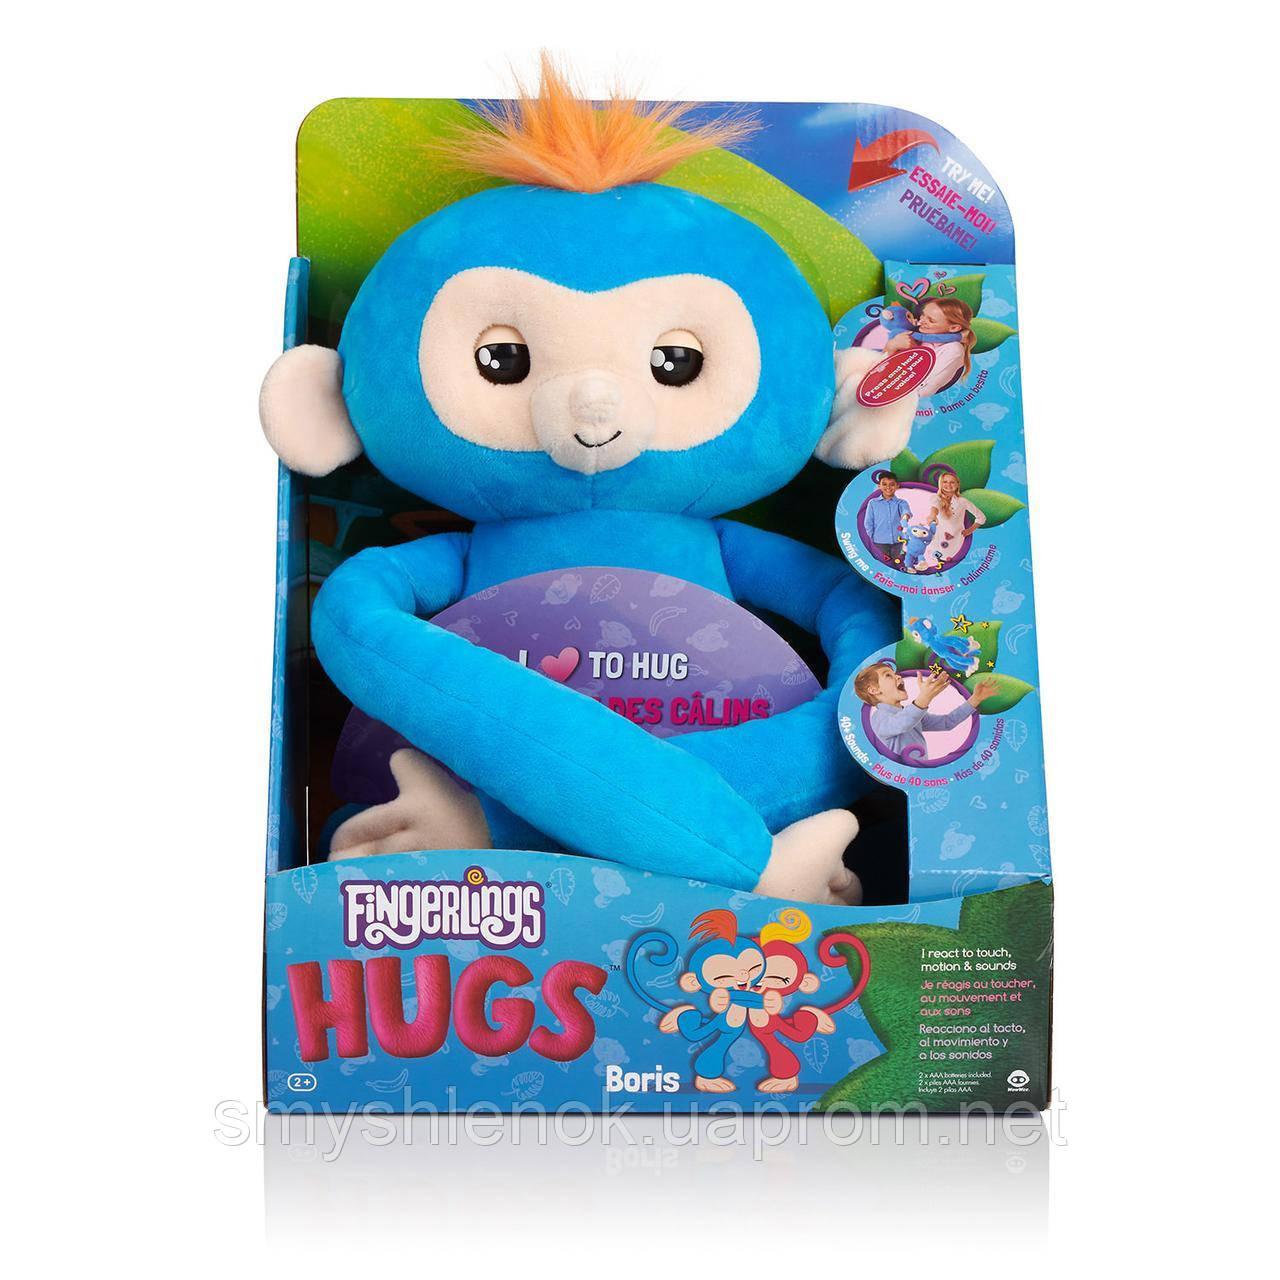 WowWee Fingerlings Мягкая интерактивная обезьянка-обнимашка Борис